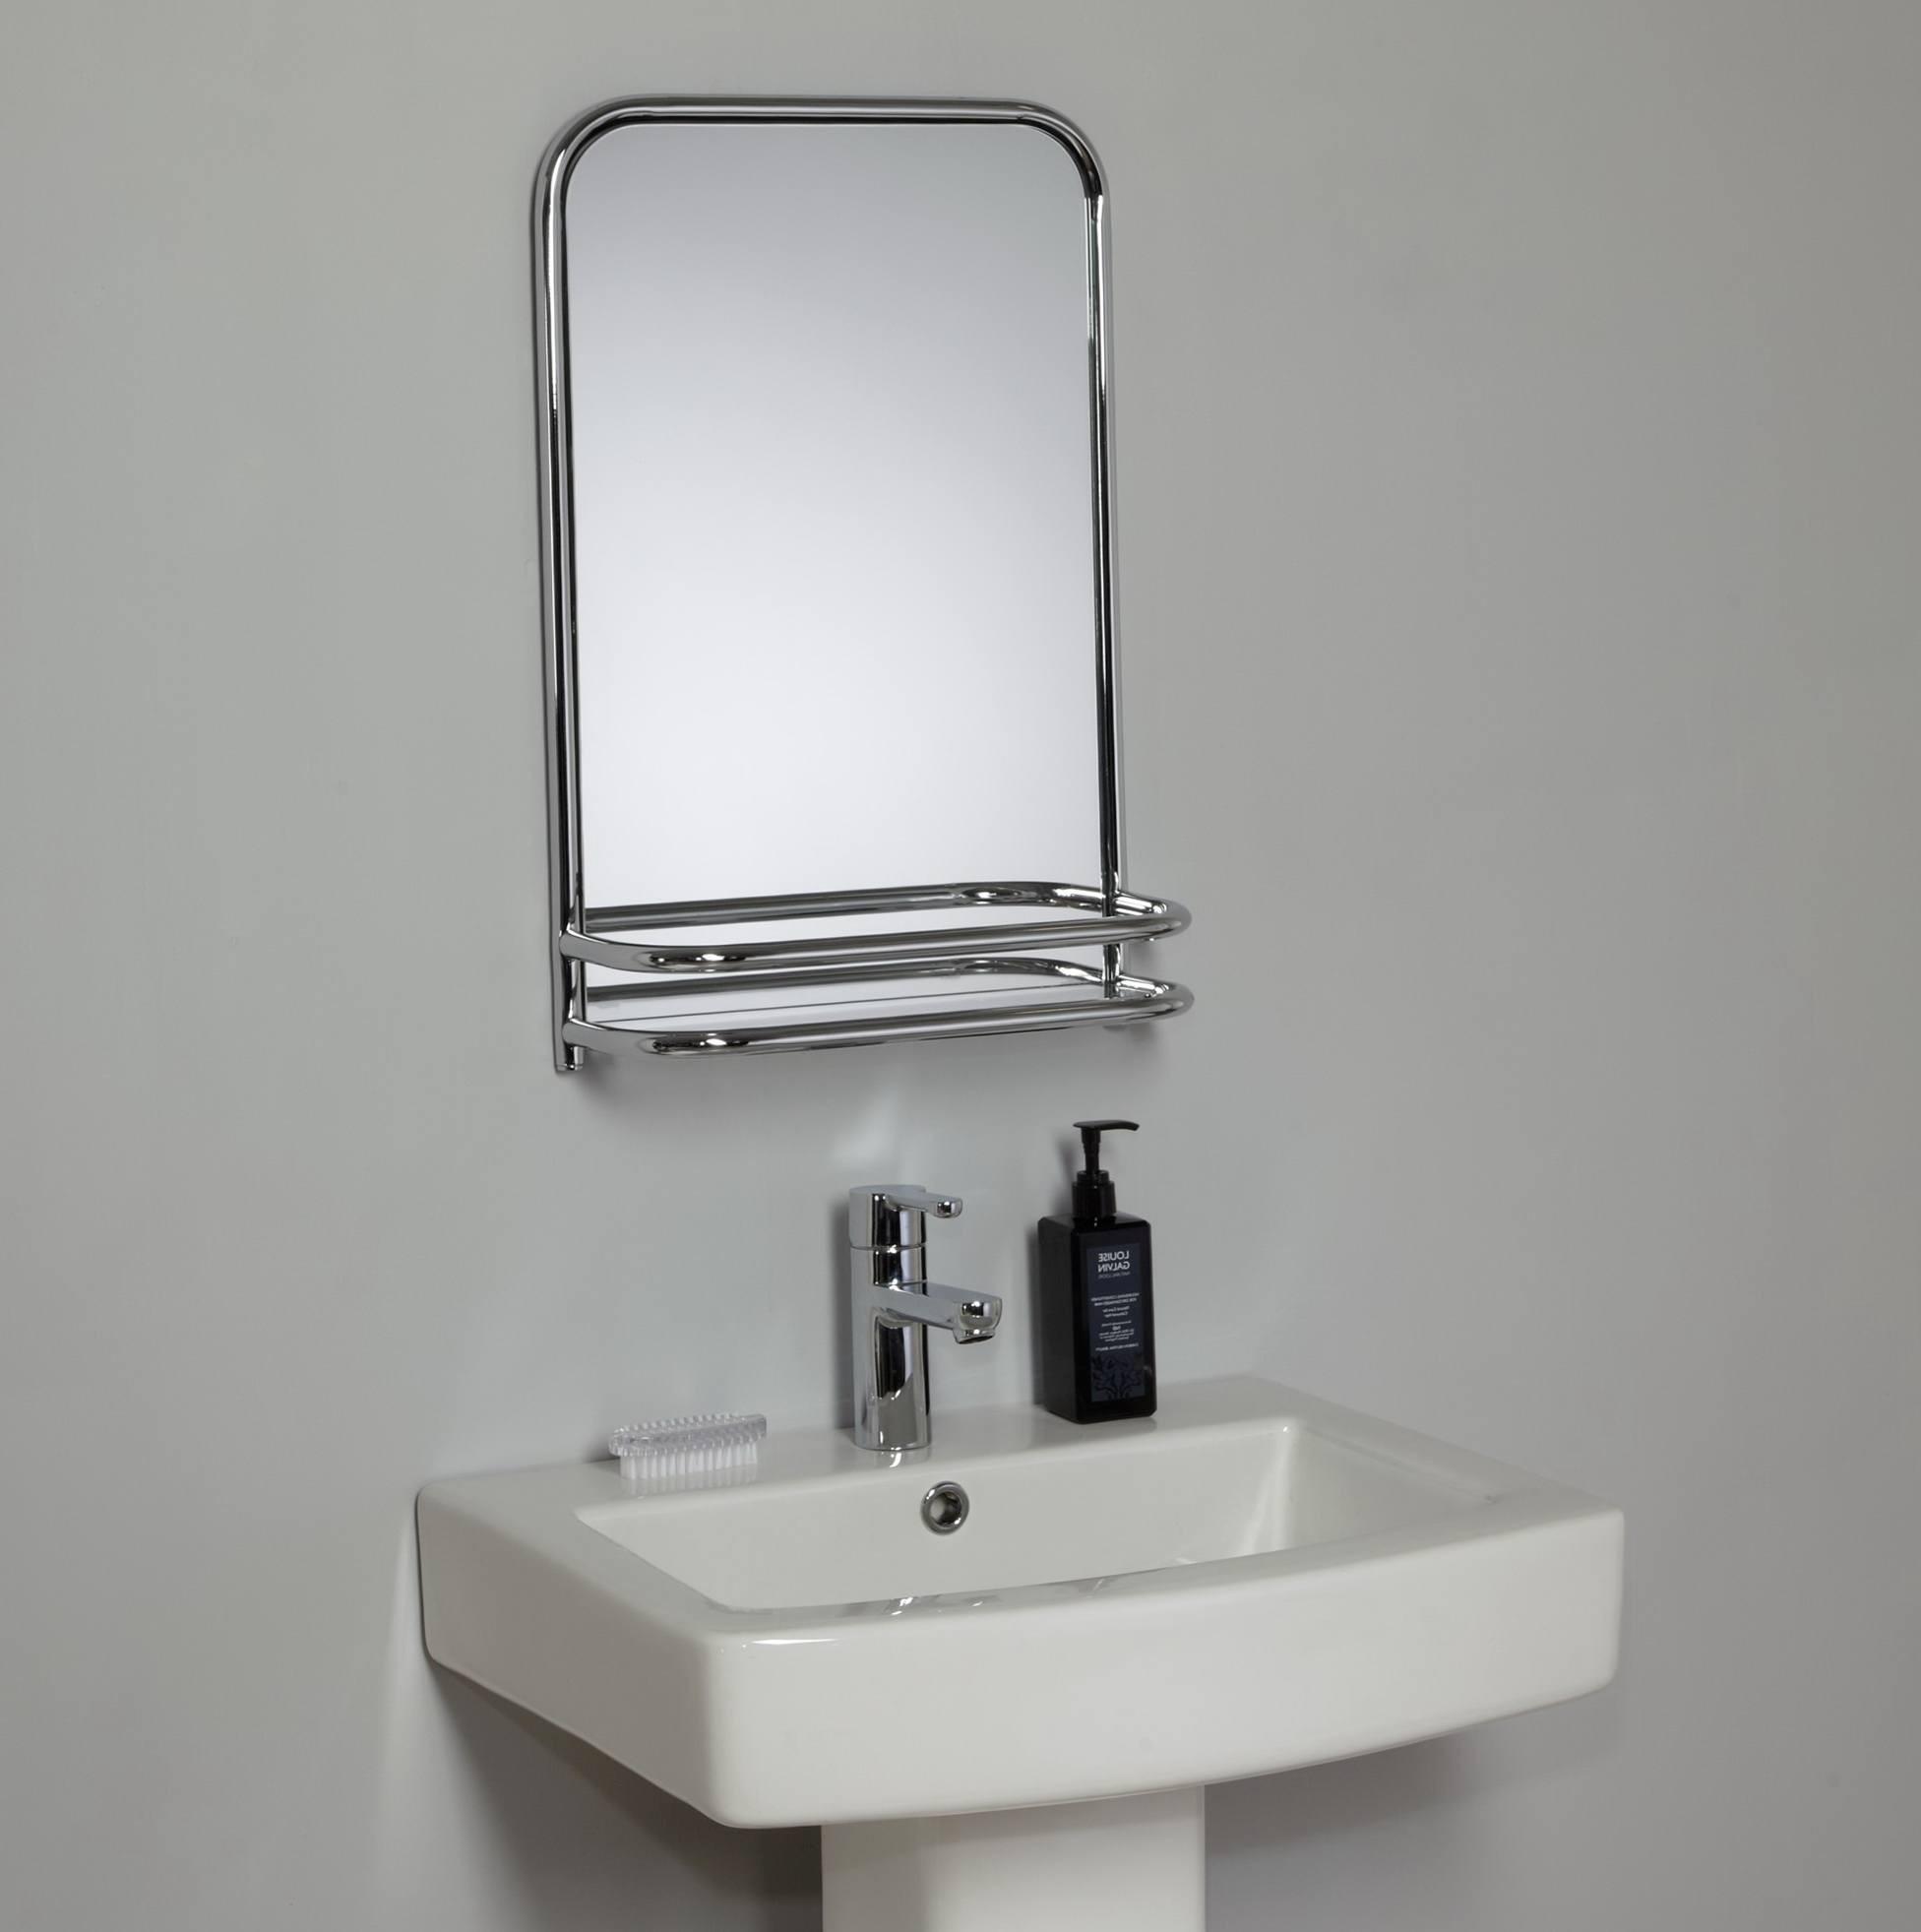 Unique Cheap Bathroom Mirrors Construction Bathroom Design Ideas Gallery Image And Wallpaper